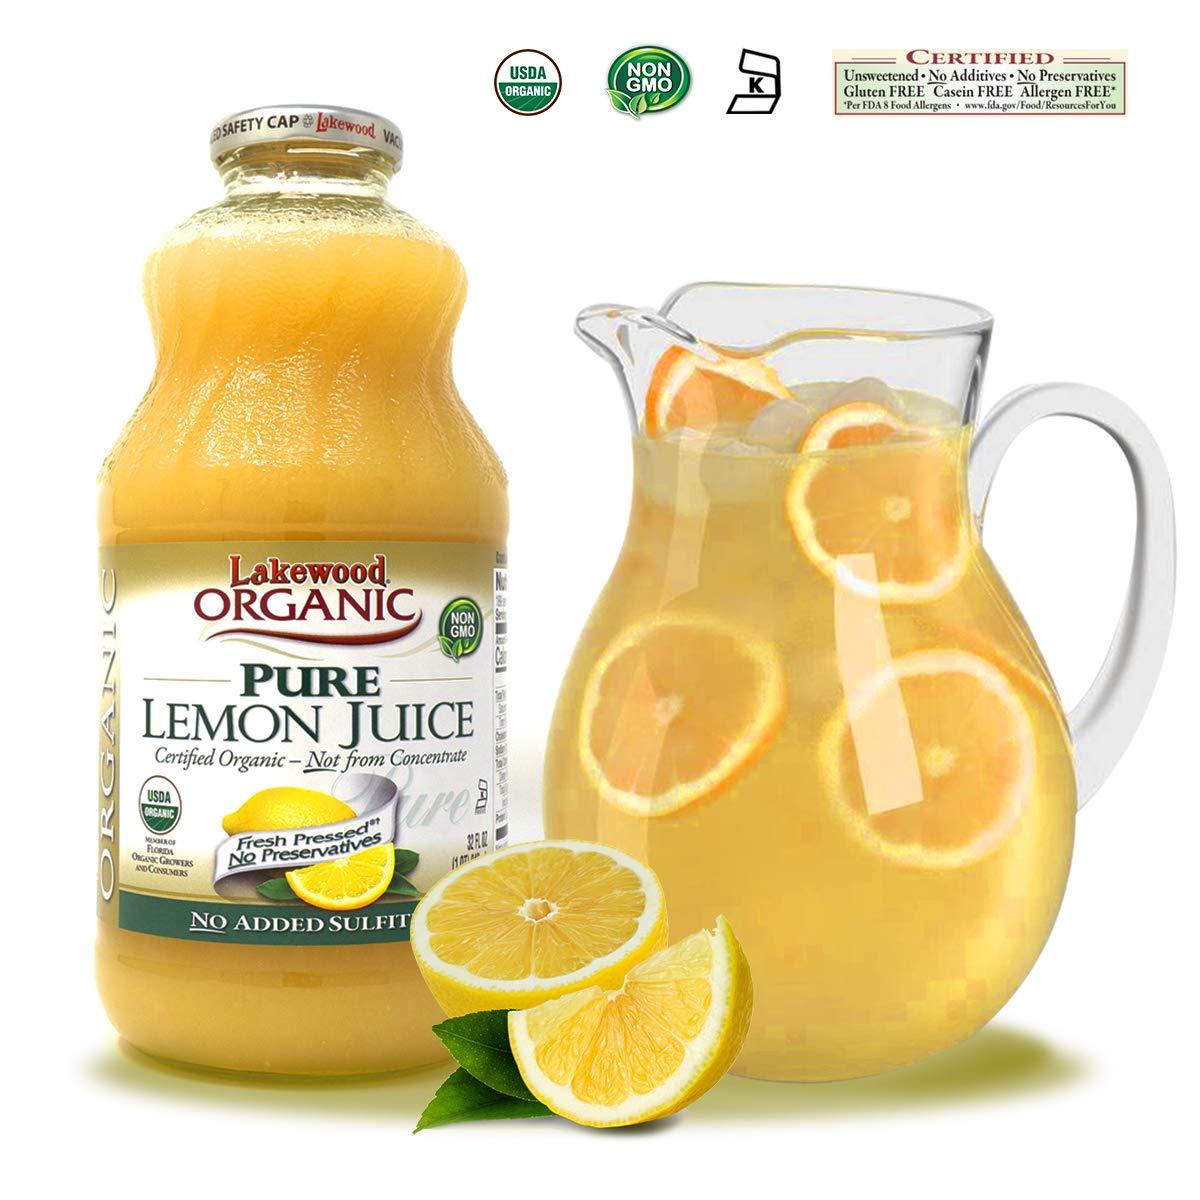 Lakewood Organic Pure Lemon, 32 Ounce (Pack of 6) by Lakewood (Image #7)